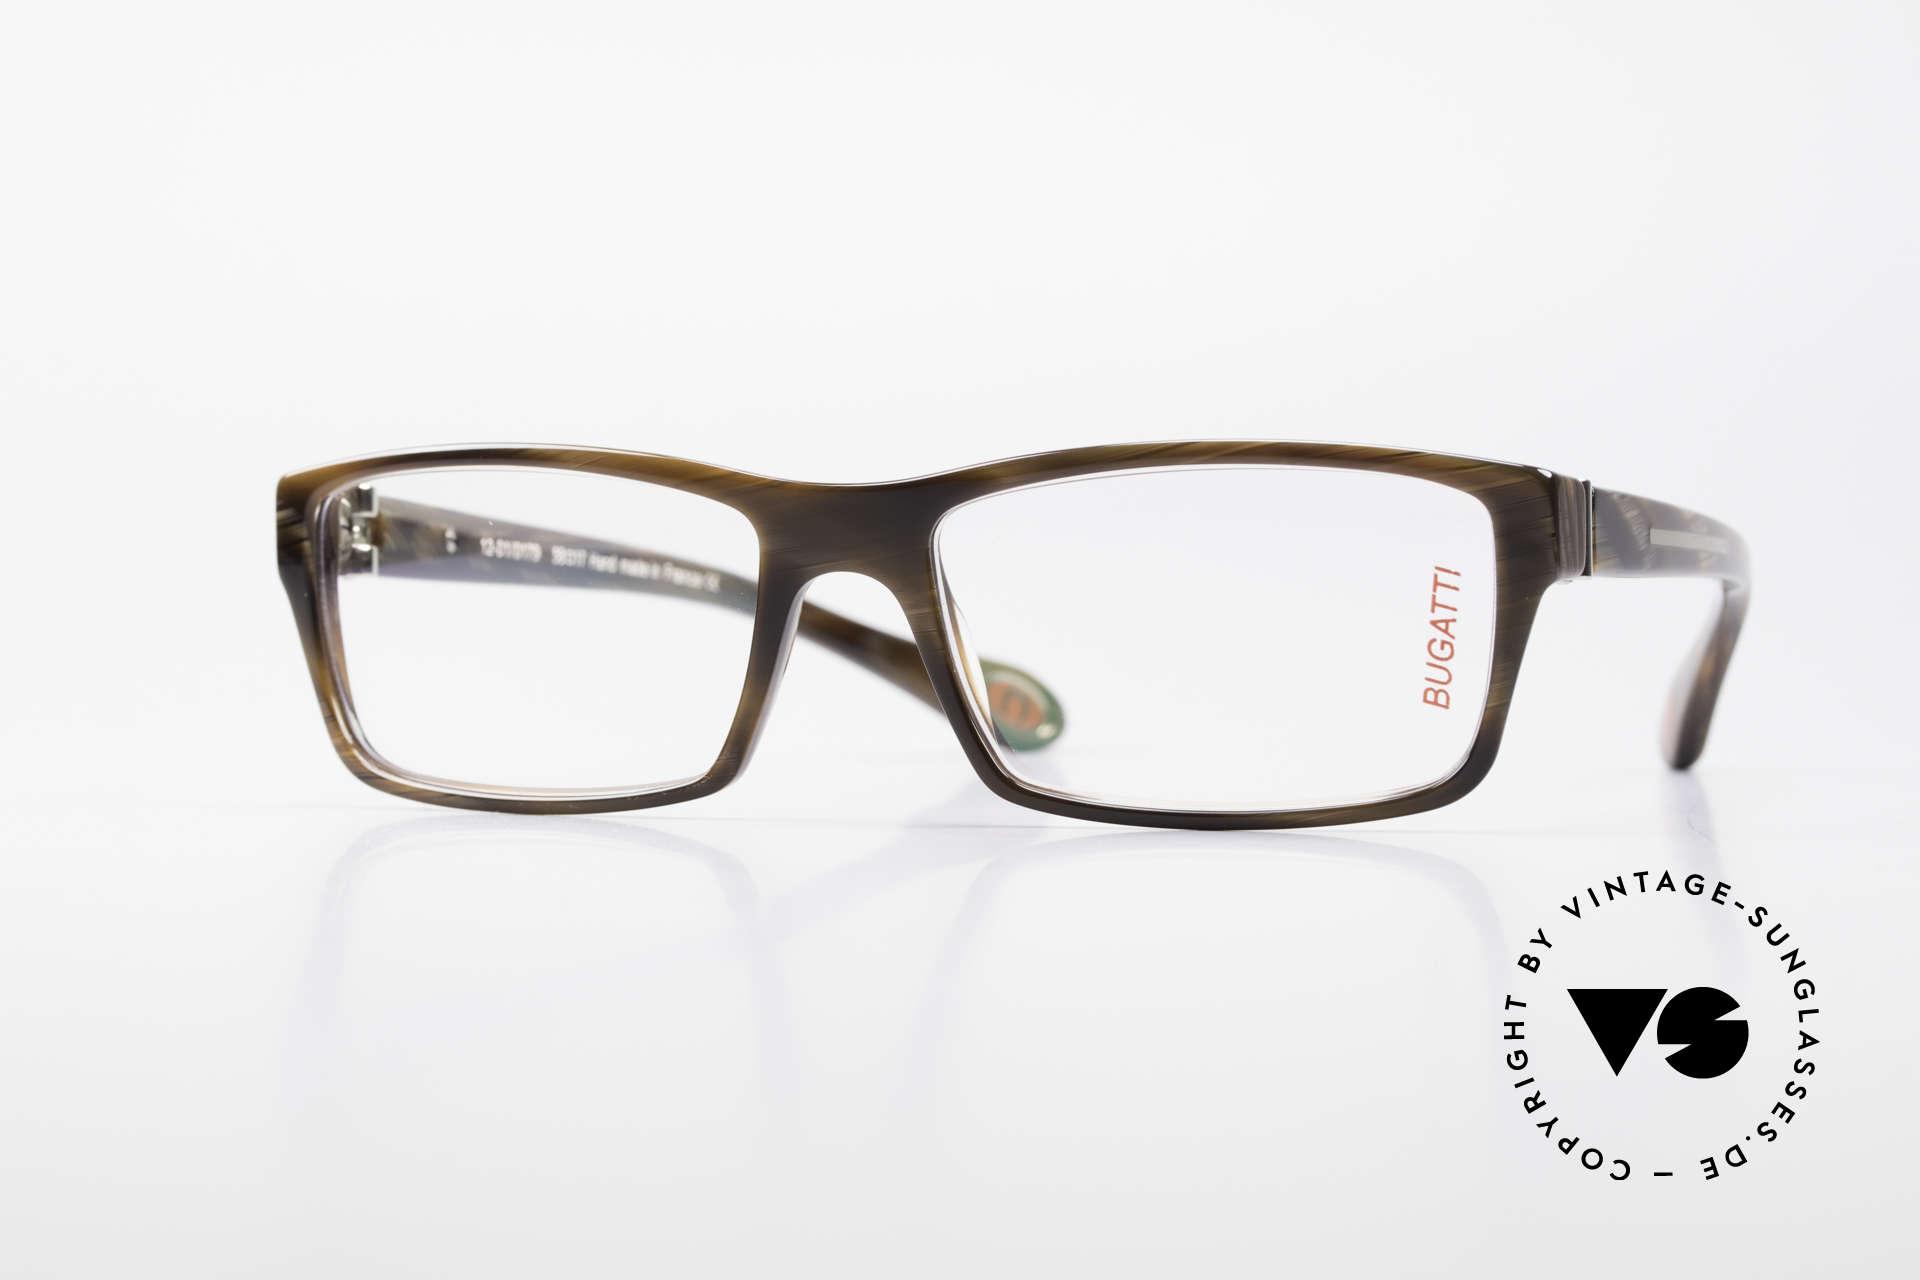 Bugatti 487 Striking Designer Glasses Men, striking high-tech eyeglass-frame by BUGATTI, Made for Men